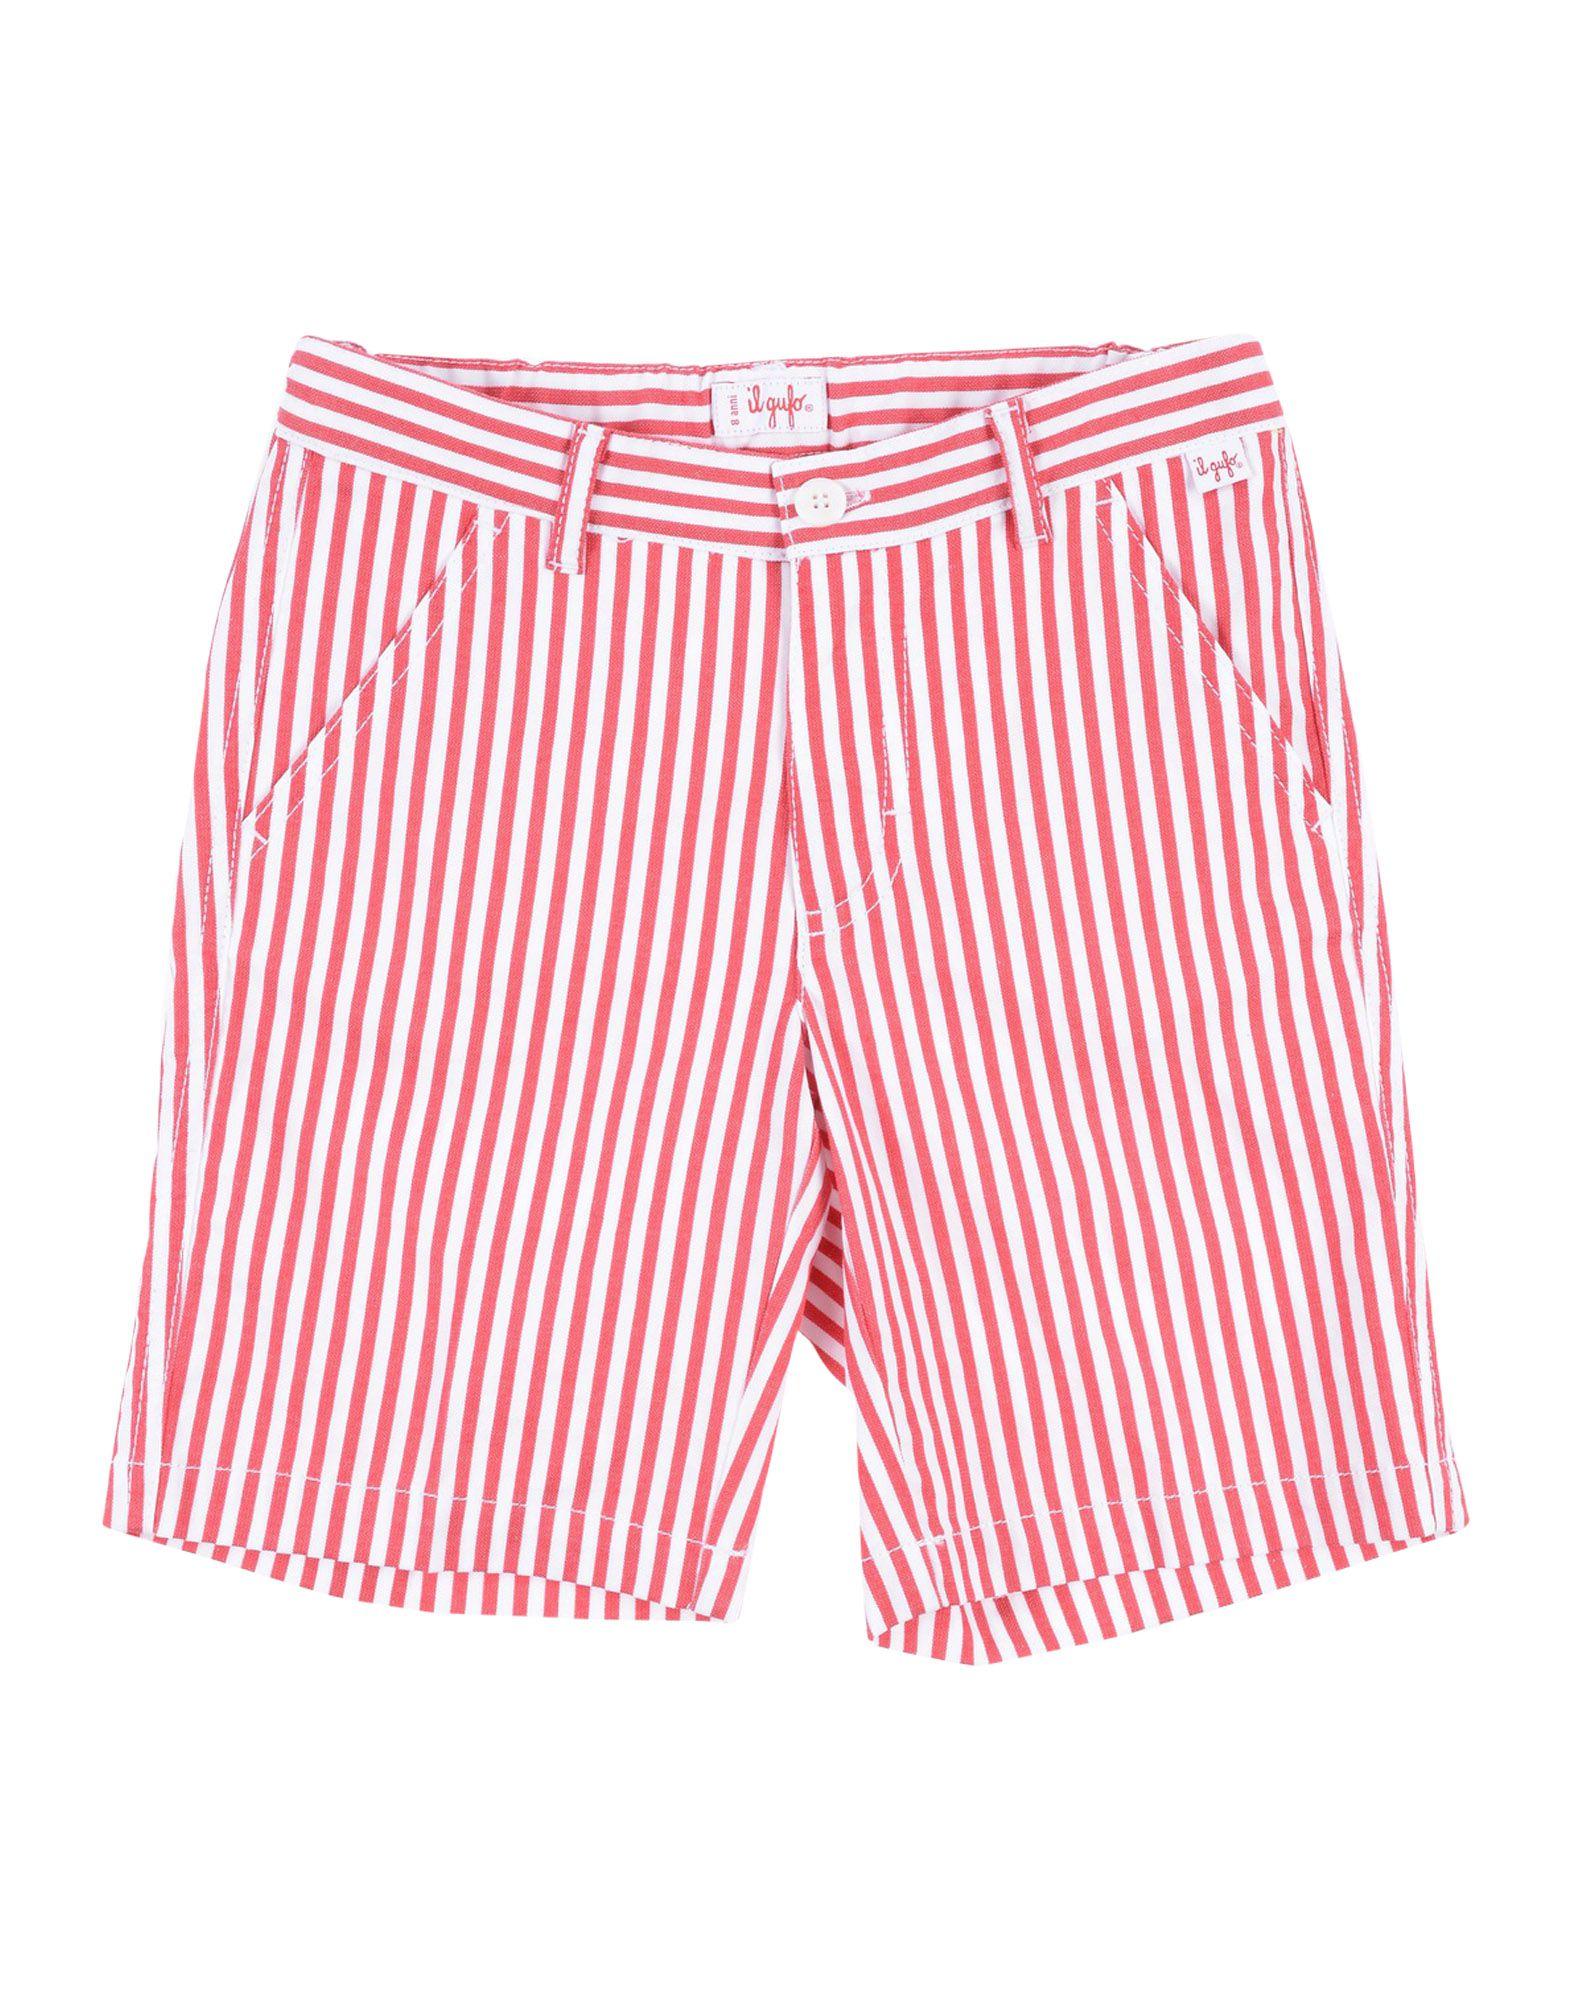 IL GUFO Бермуды il gufo комплект из футболки брюк и худи в полоску